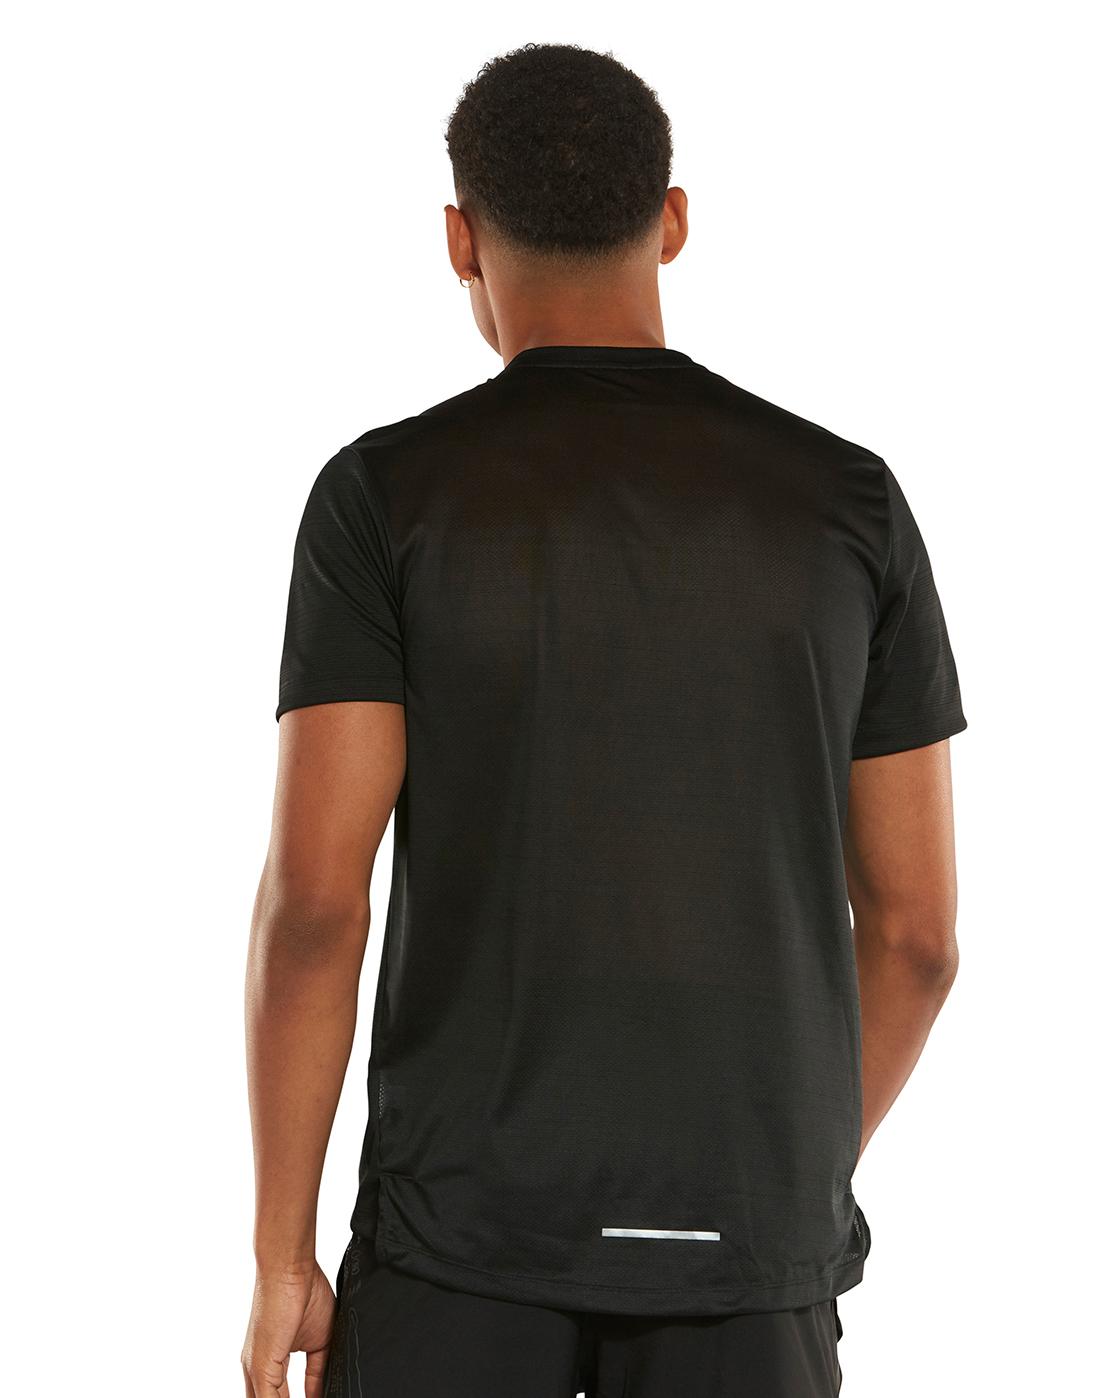 285a5217e40a ... Mens Dry Miler T-Shirt. FOR RUNNING